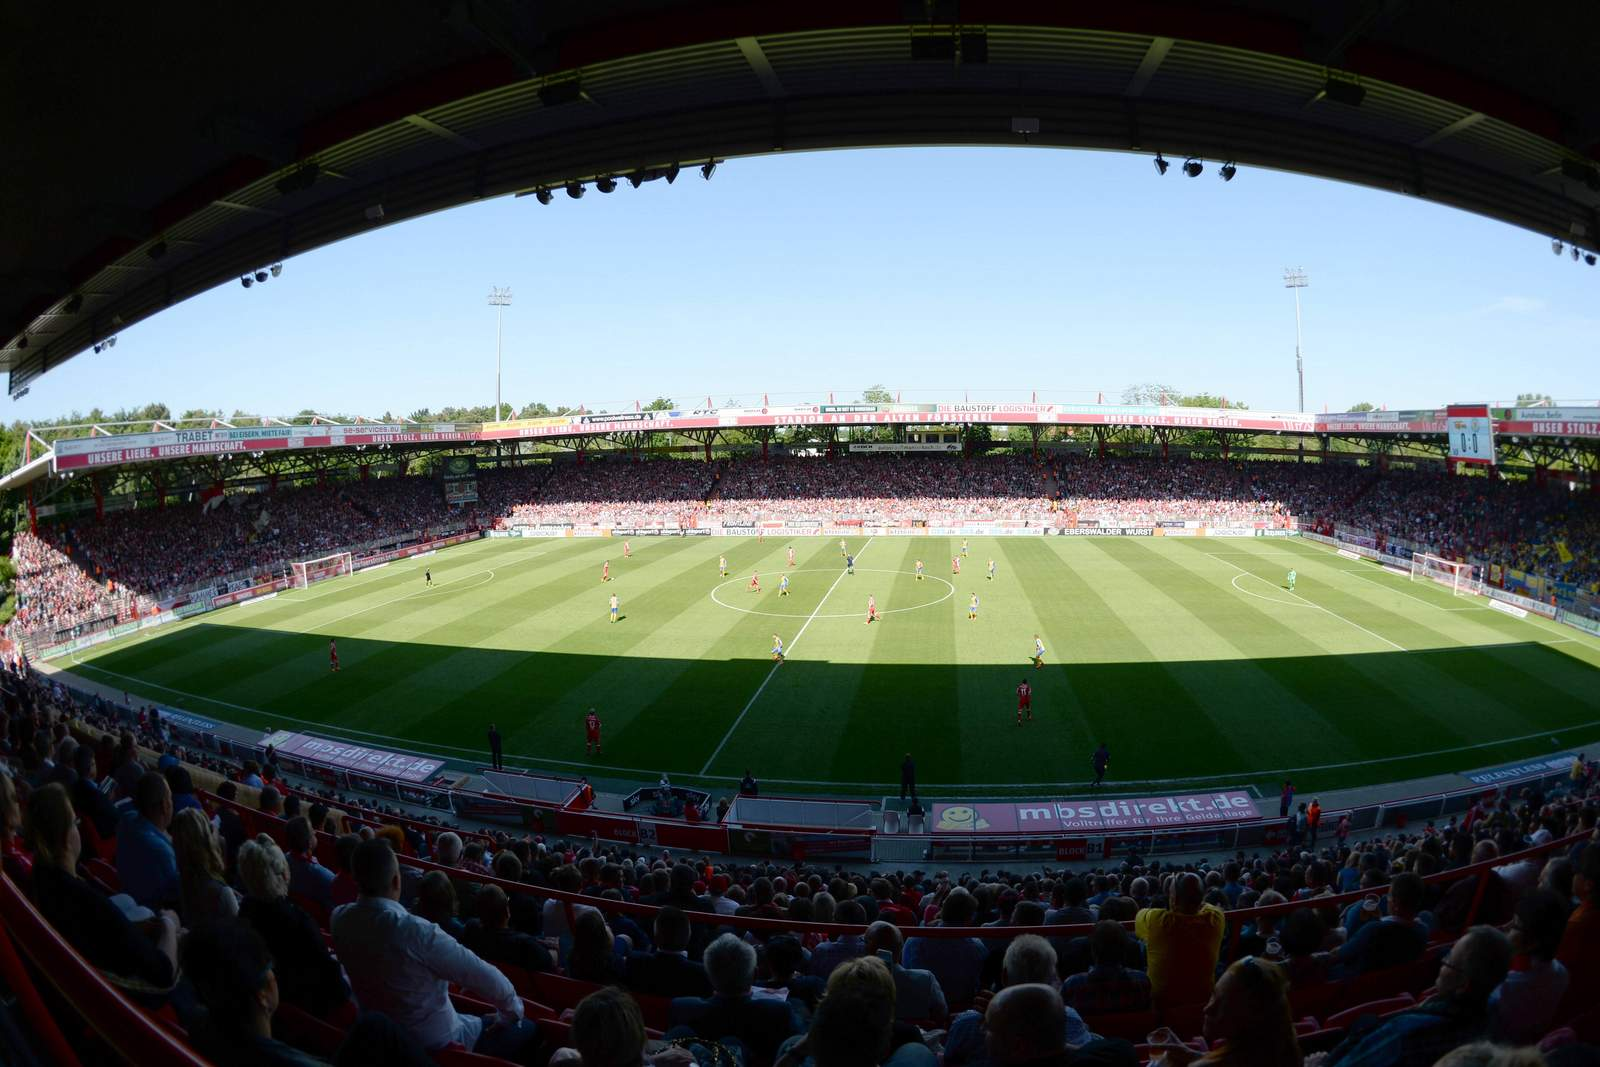 Stadion des 1. FC Union Berlin